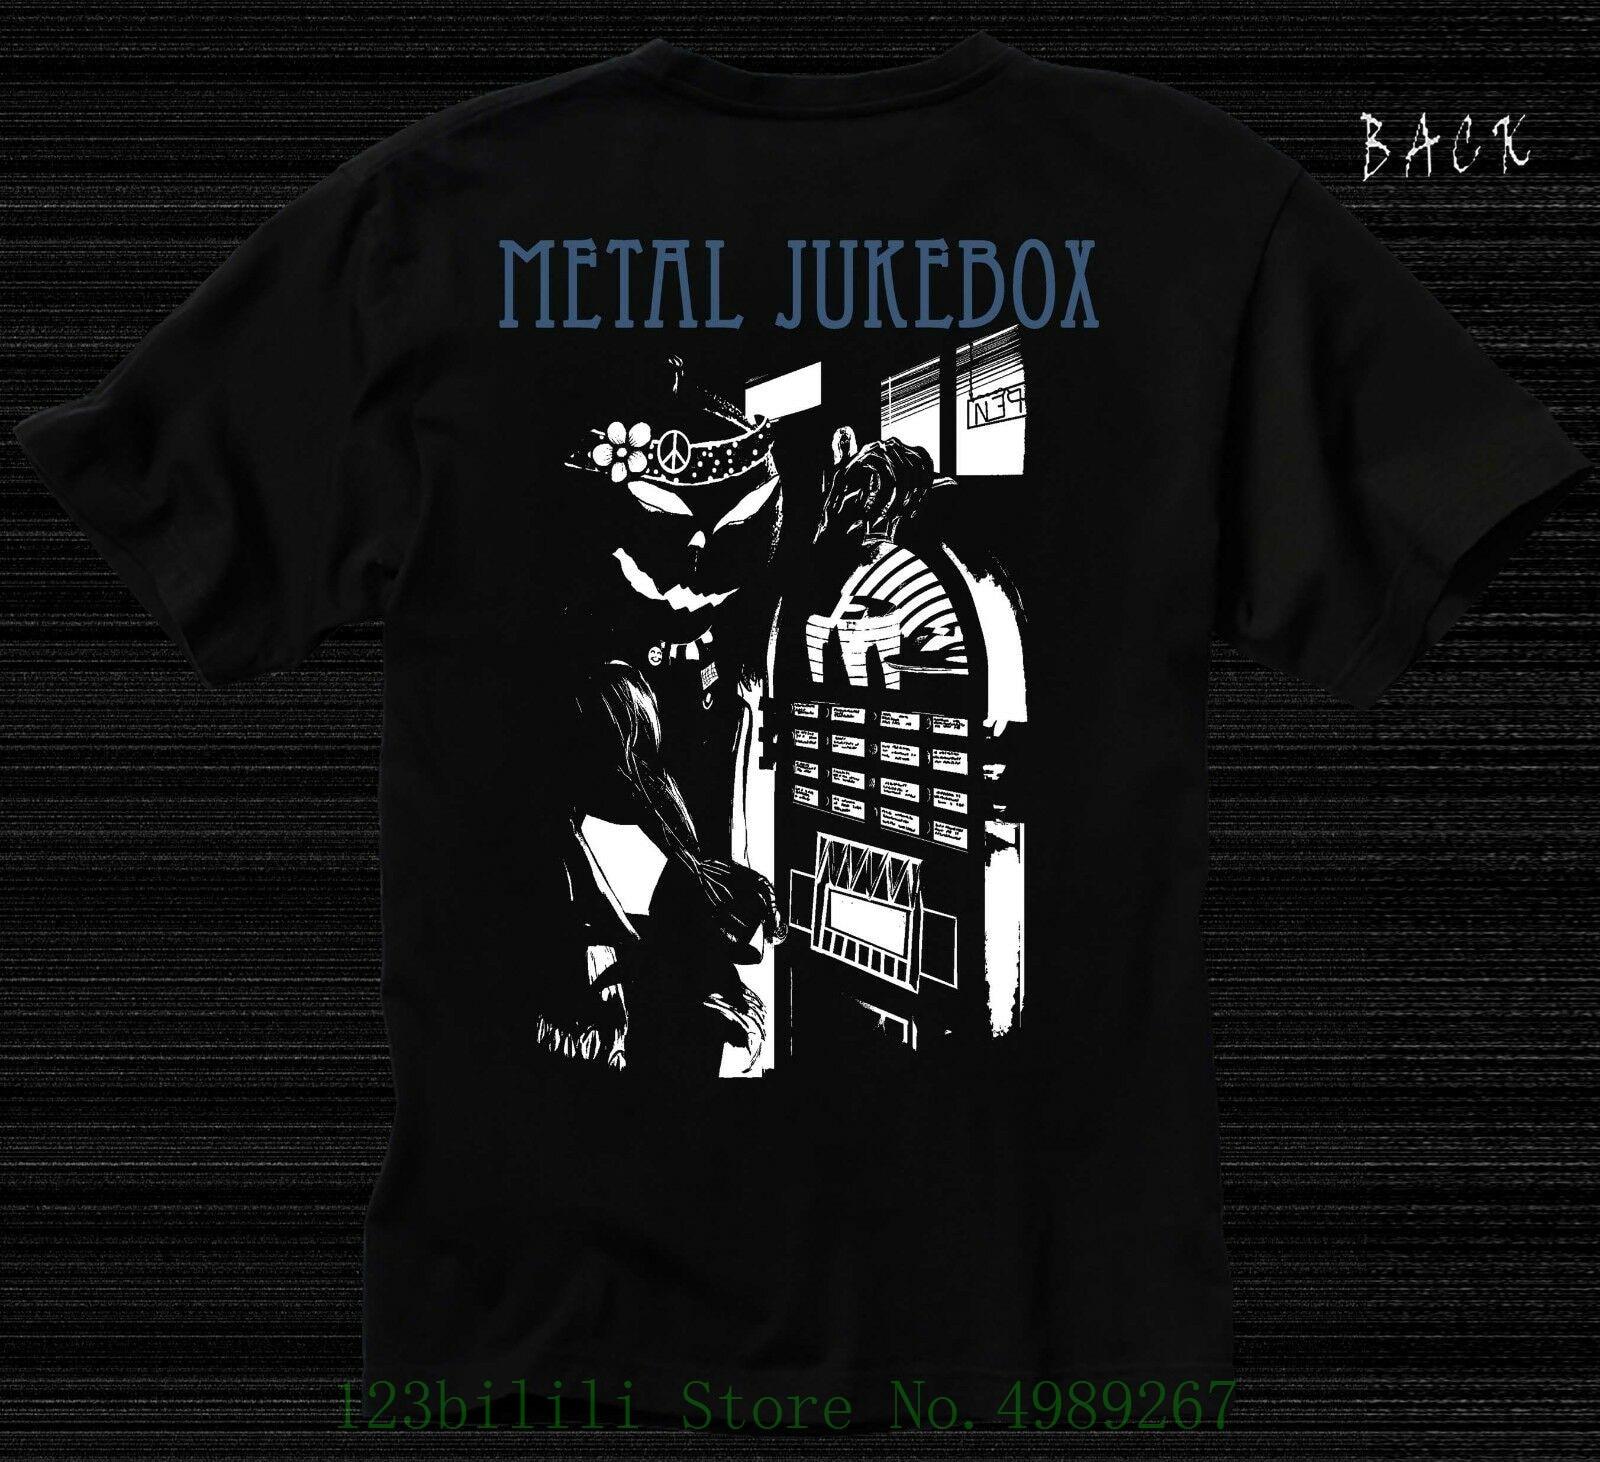 T/_shirt-sizes:S to 7XL HELLOWEEN-7 Sinners-power metal band-Blind Guardian